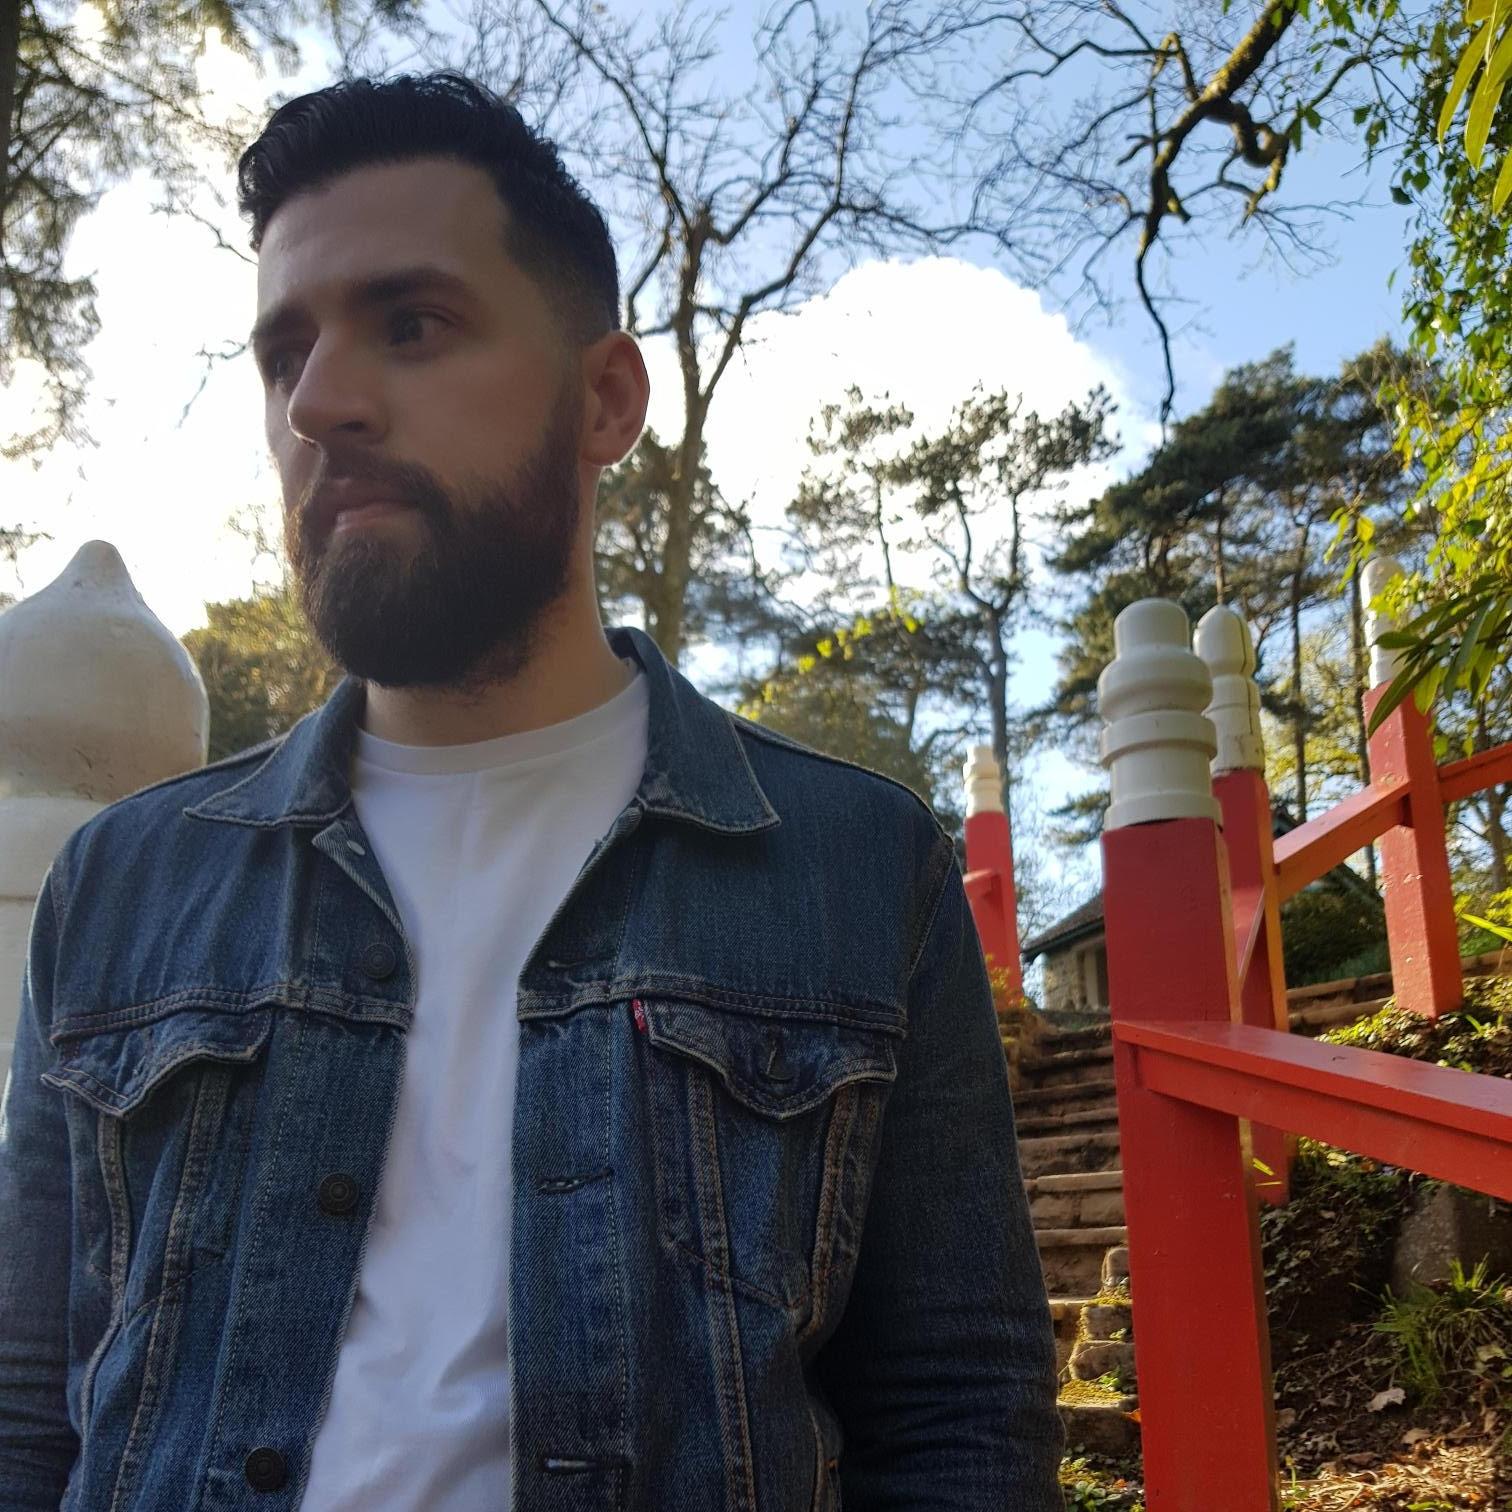 Chris Noir - Indie / alt / singer songwriter